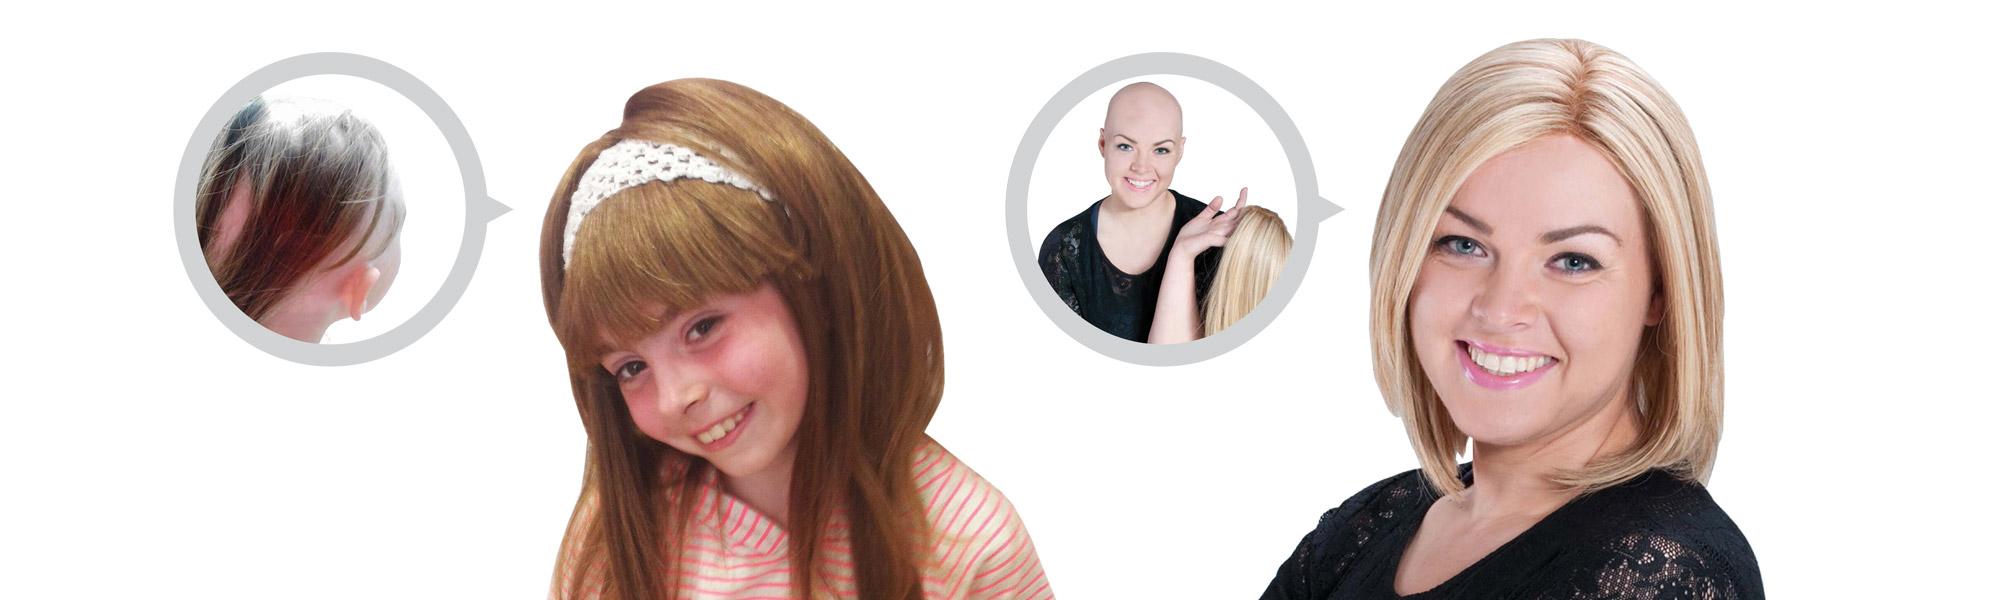 Wigs - bespoke fitting human hair wigs - trichologist